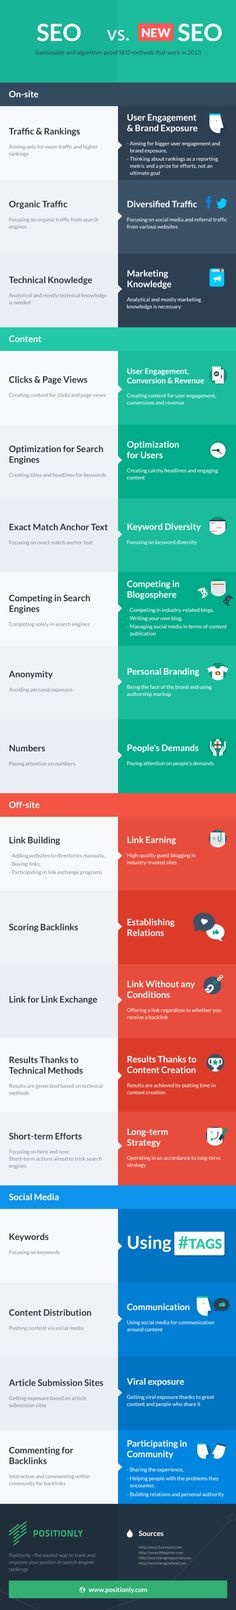 Optimización en buscadores antes y ahora #SEO #infografia